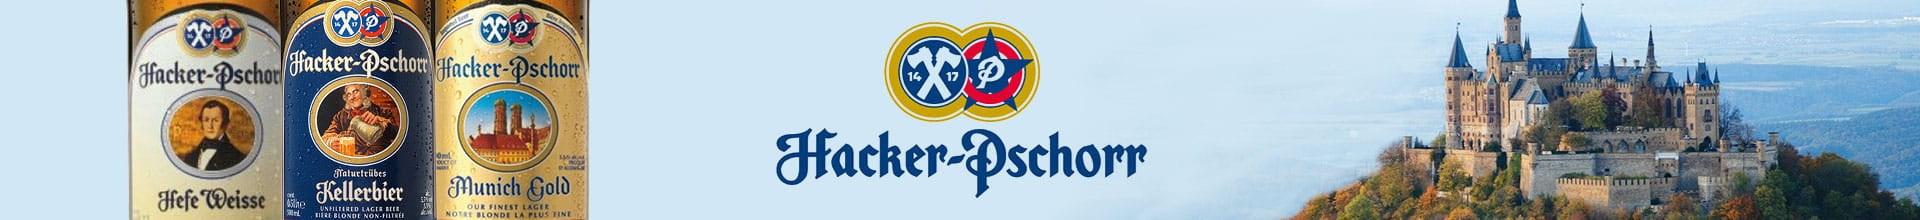 Cervejaria Hacker-Pschorr